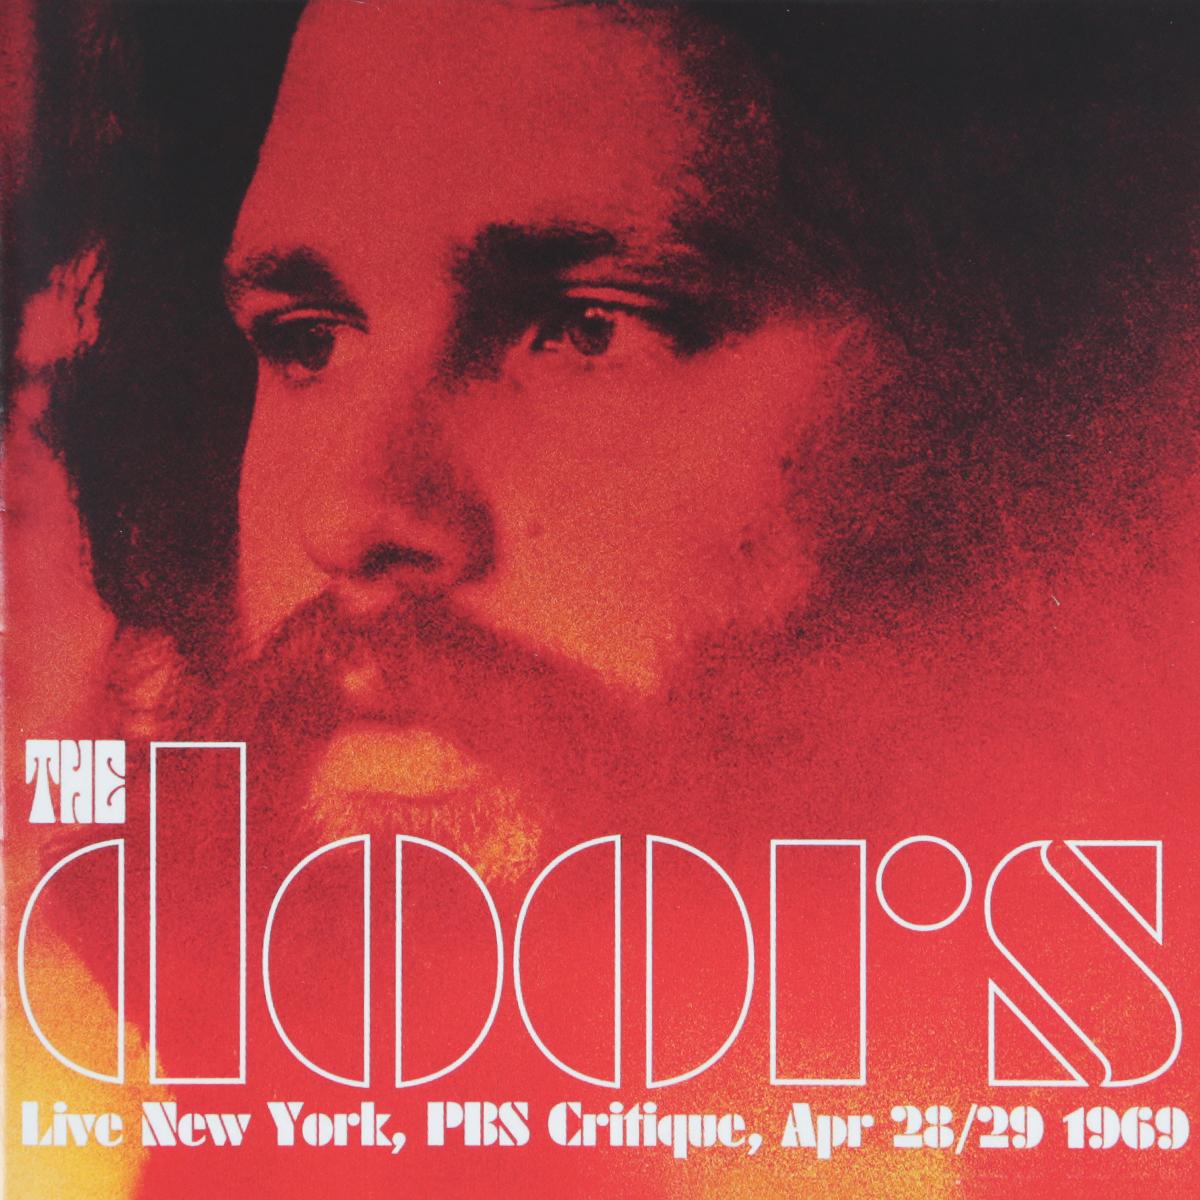 The Doors The Doors. Live New York, PBS Critique, Apr 28/29 1969